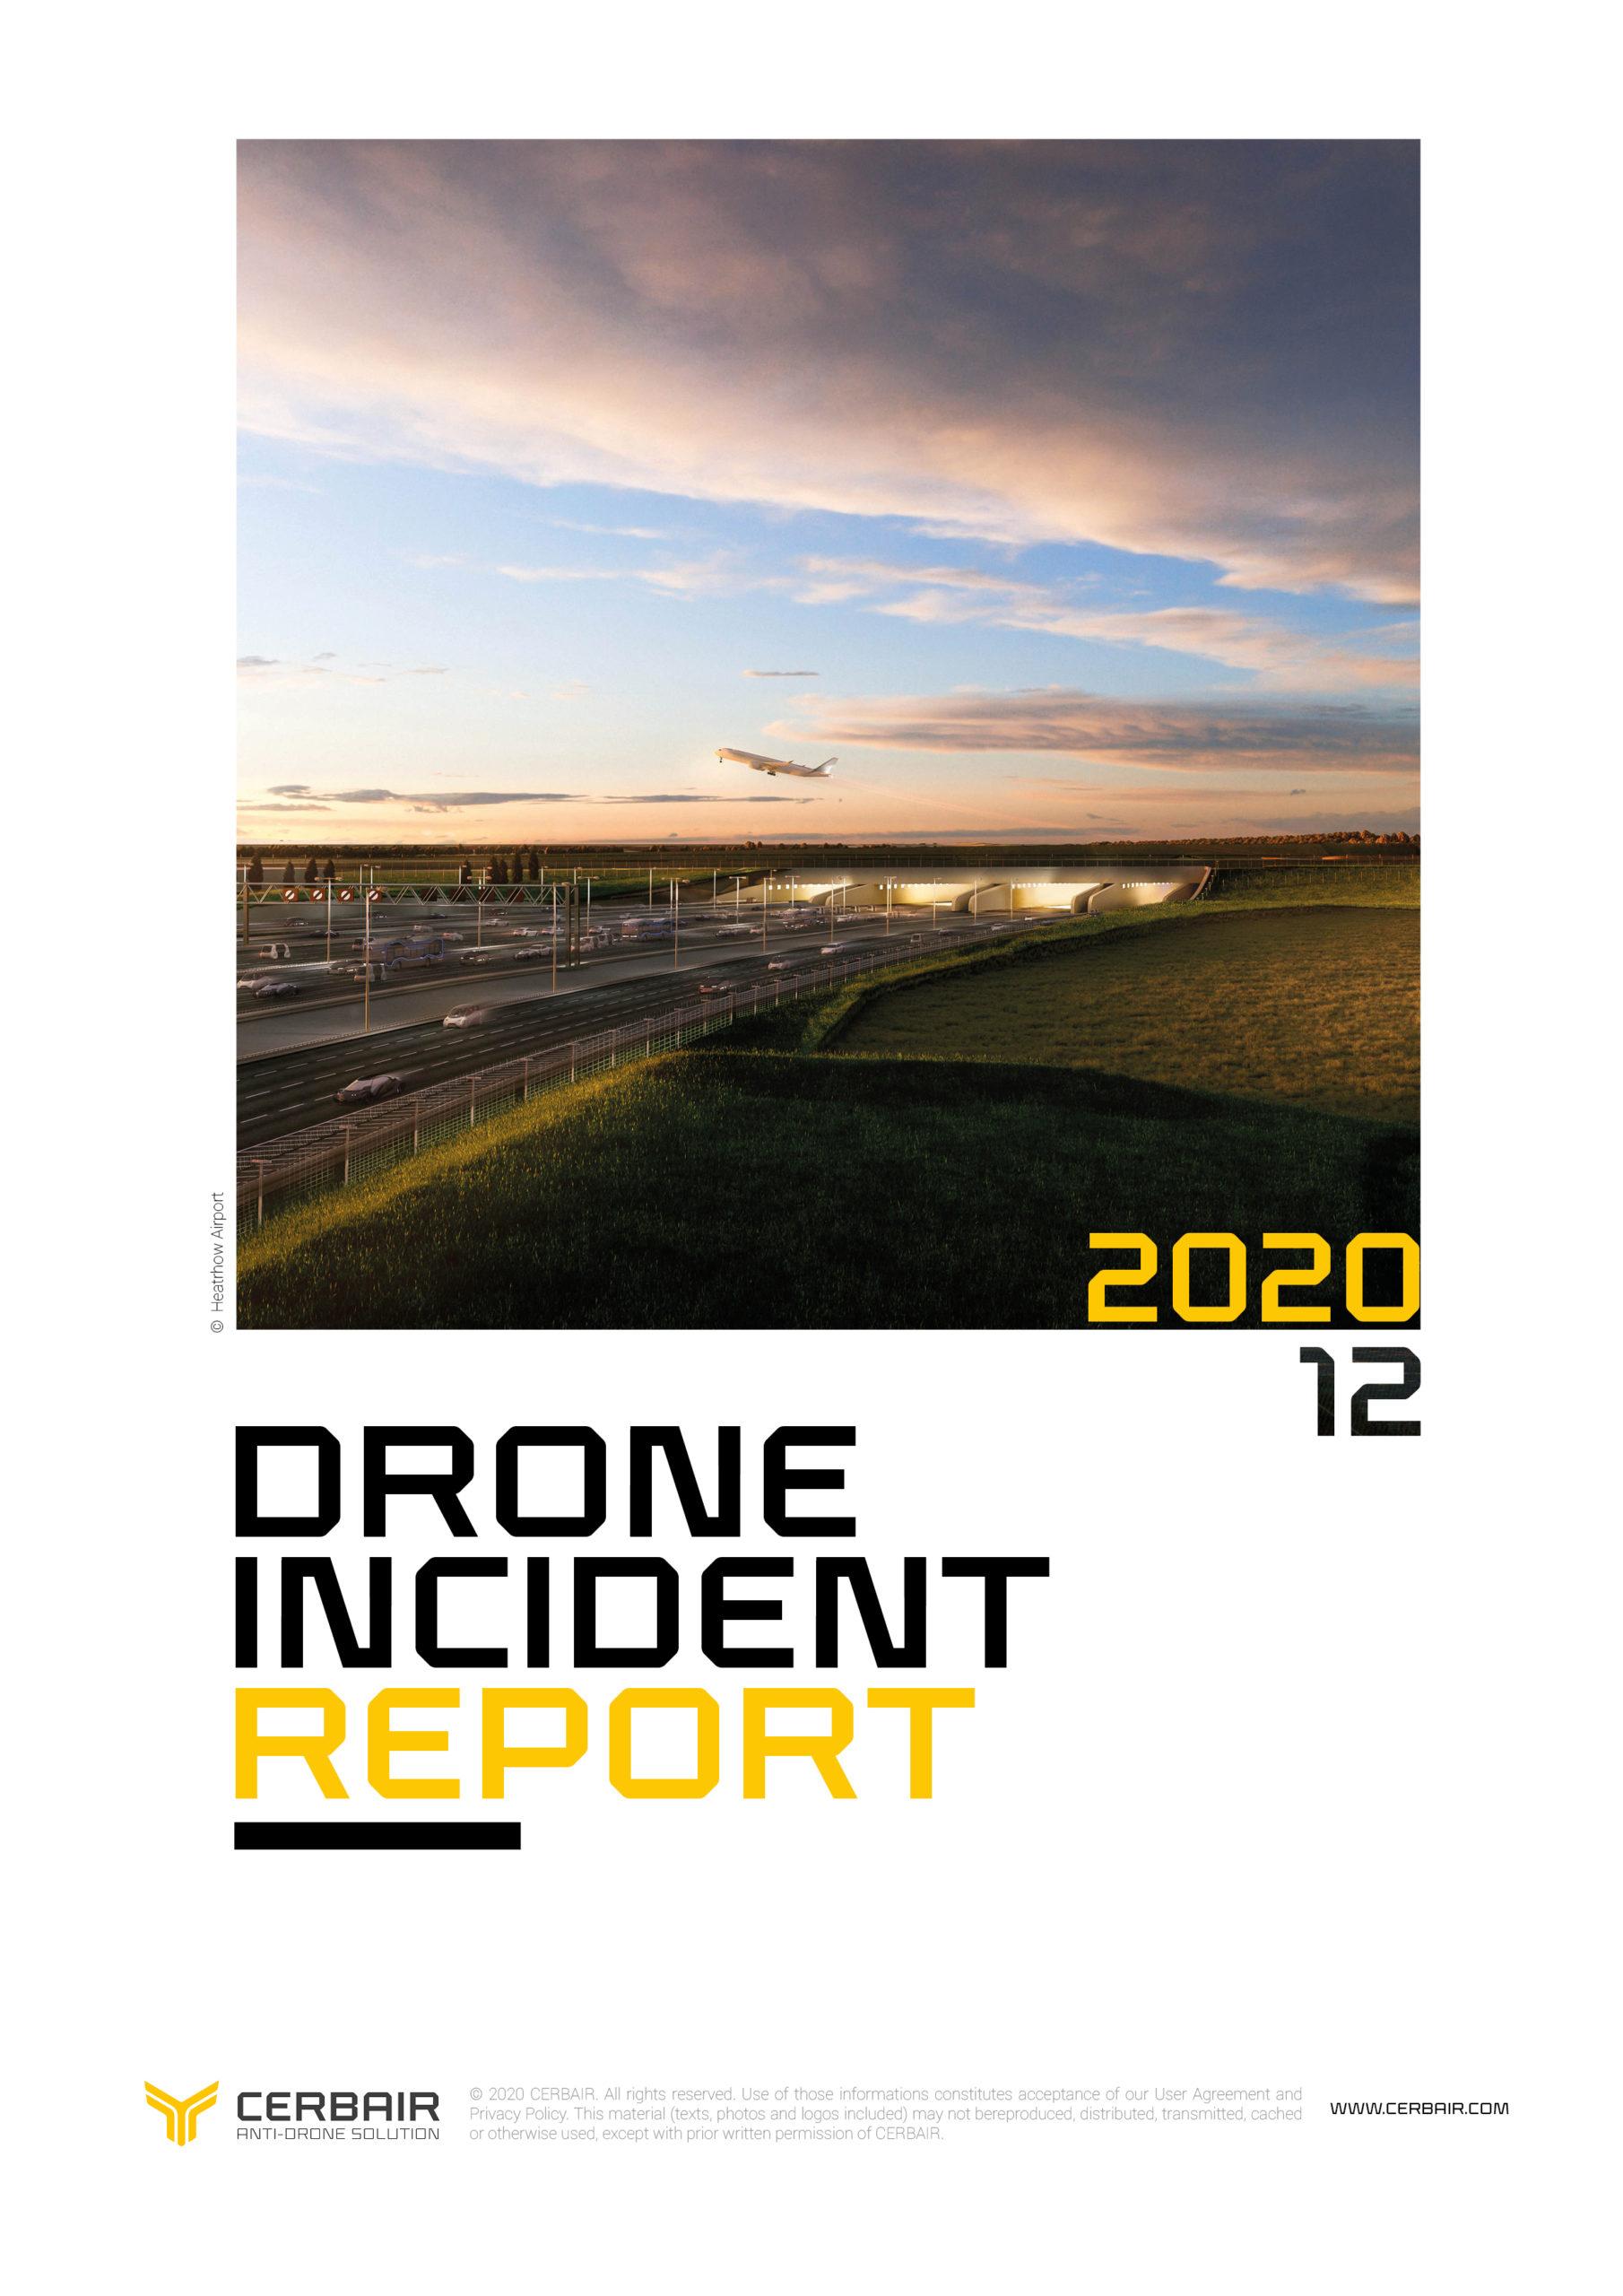 Drone Incident Report – DEC20